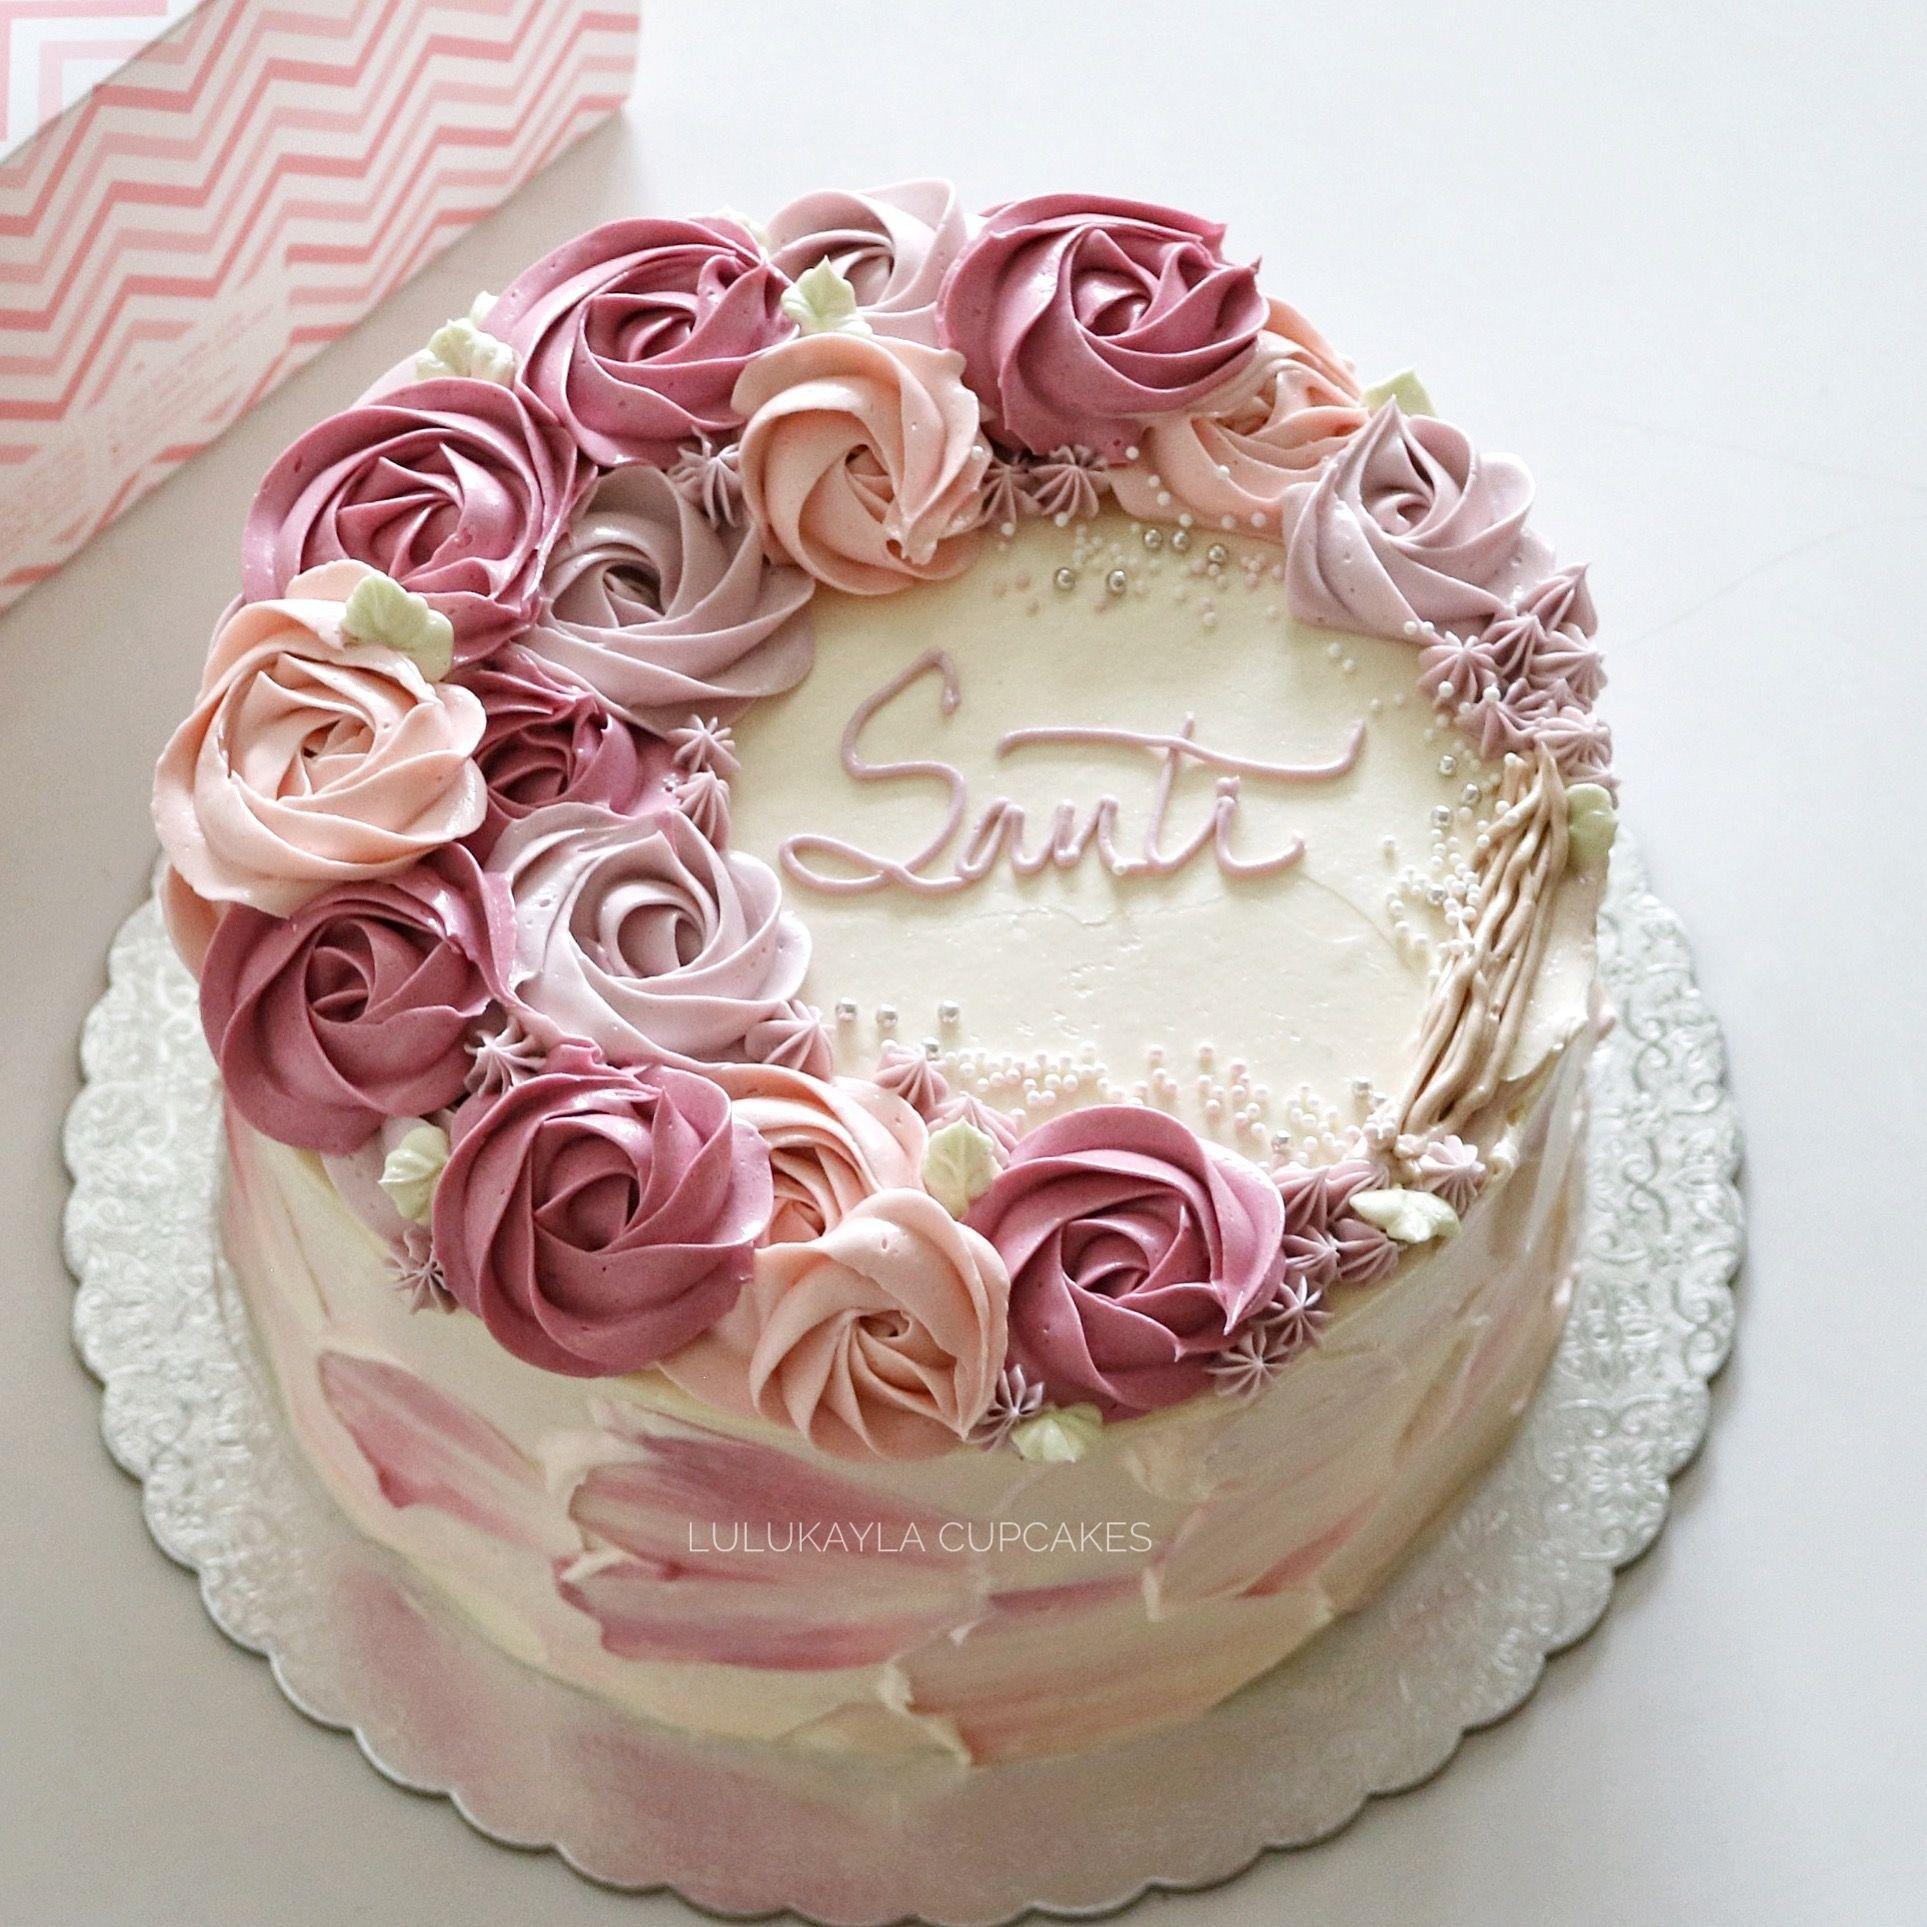 Miraculous Birthday Cake Flowers Flower Buttercream Cake Buttercream Flower Birthday Cards Printable Opercafe Filternl